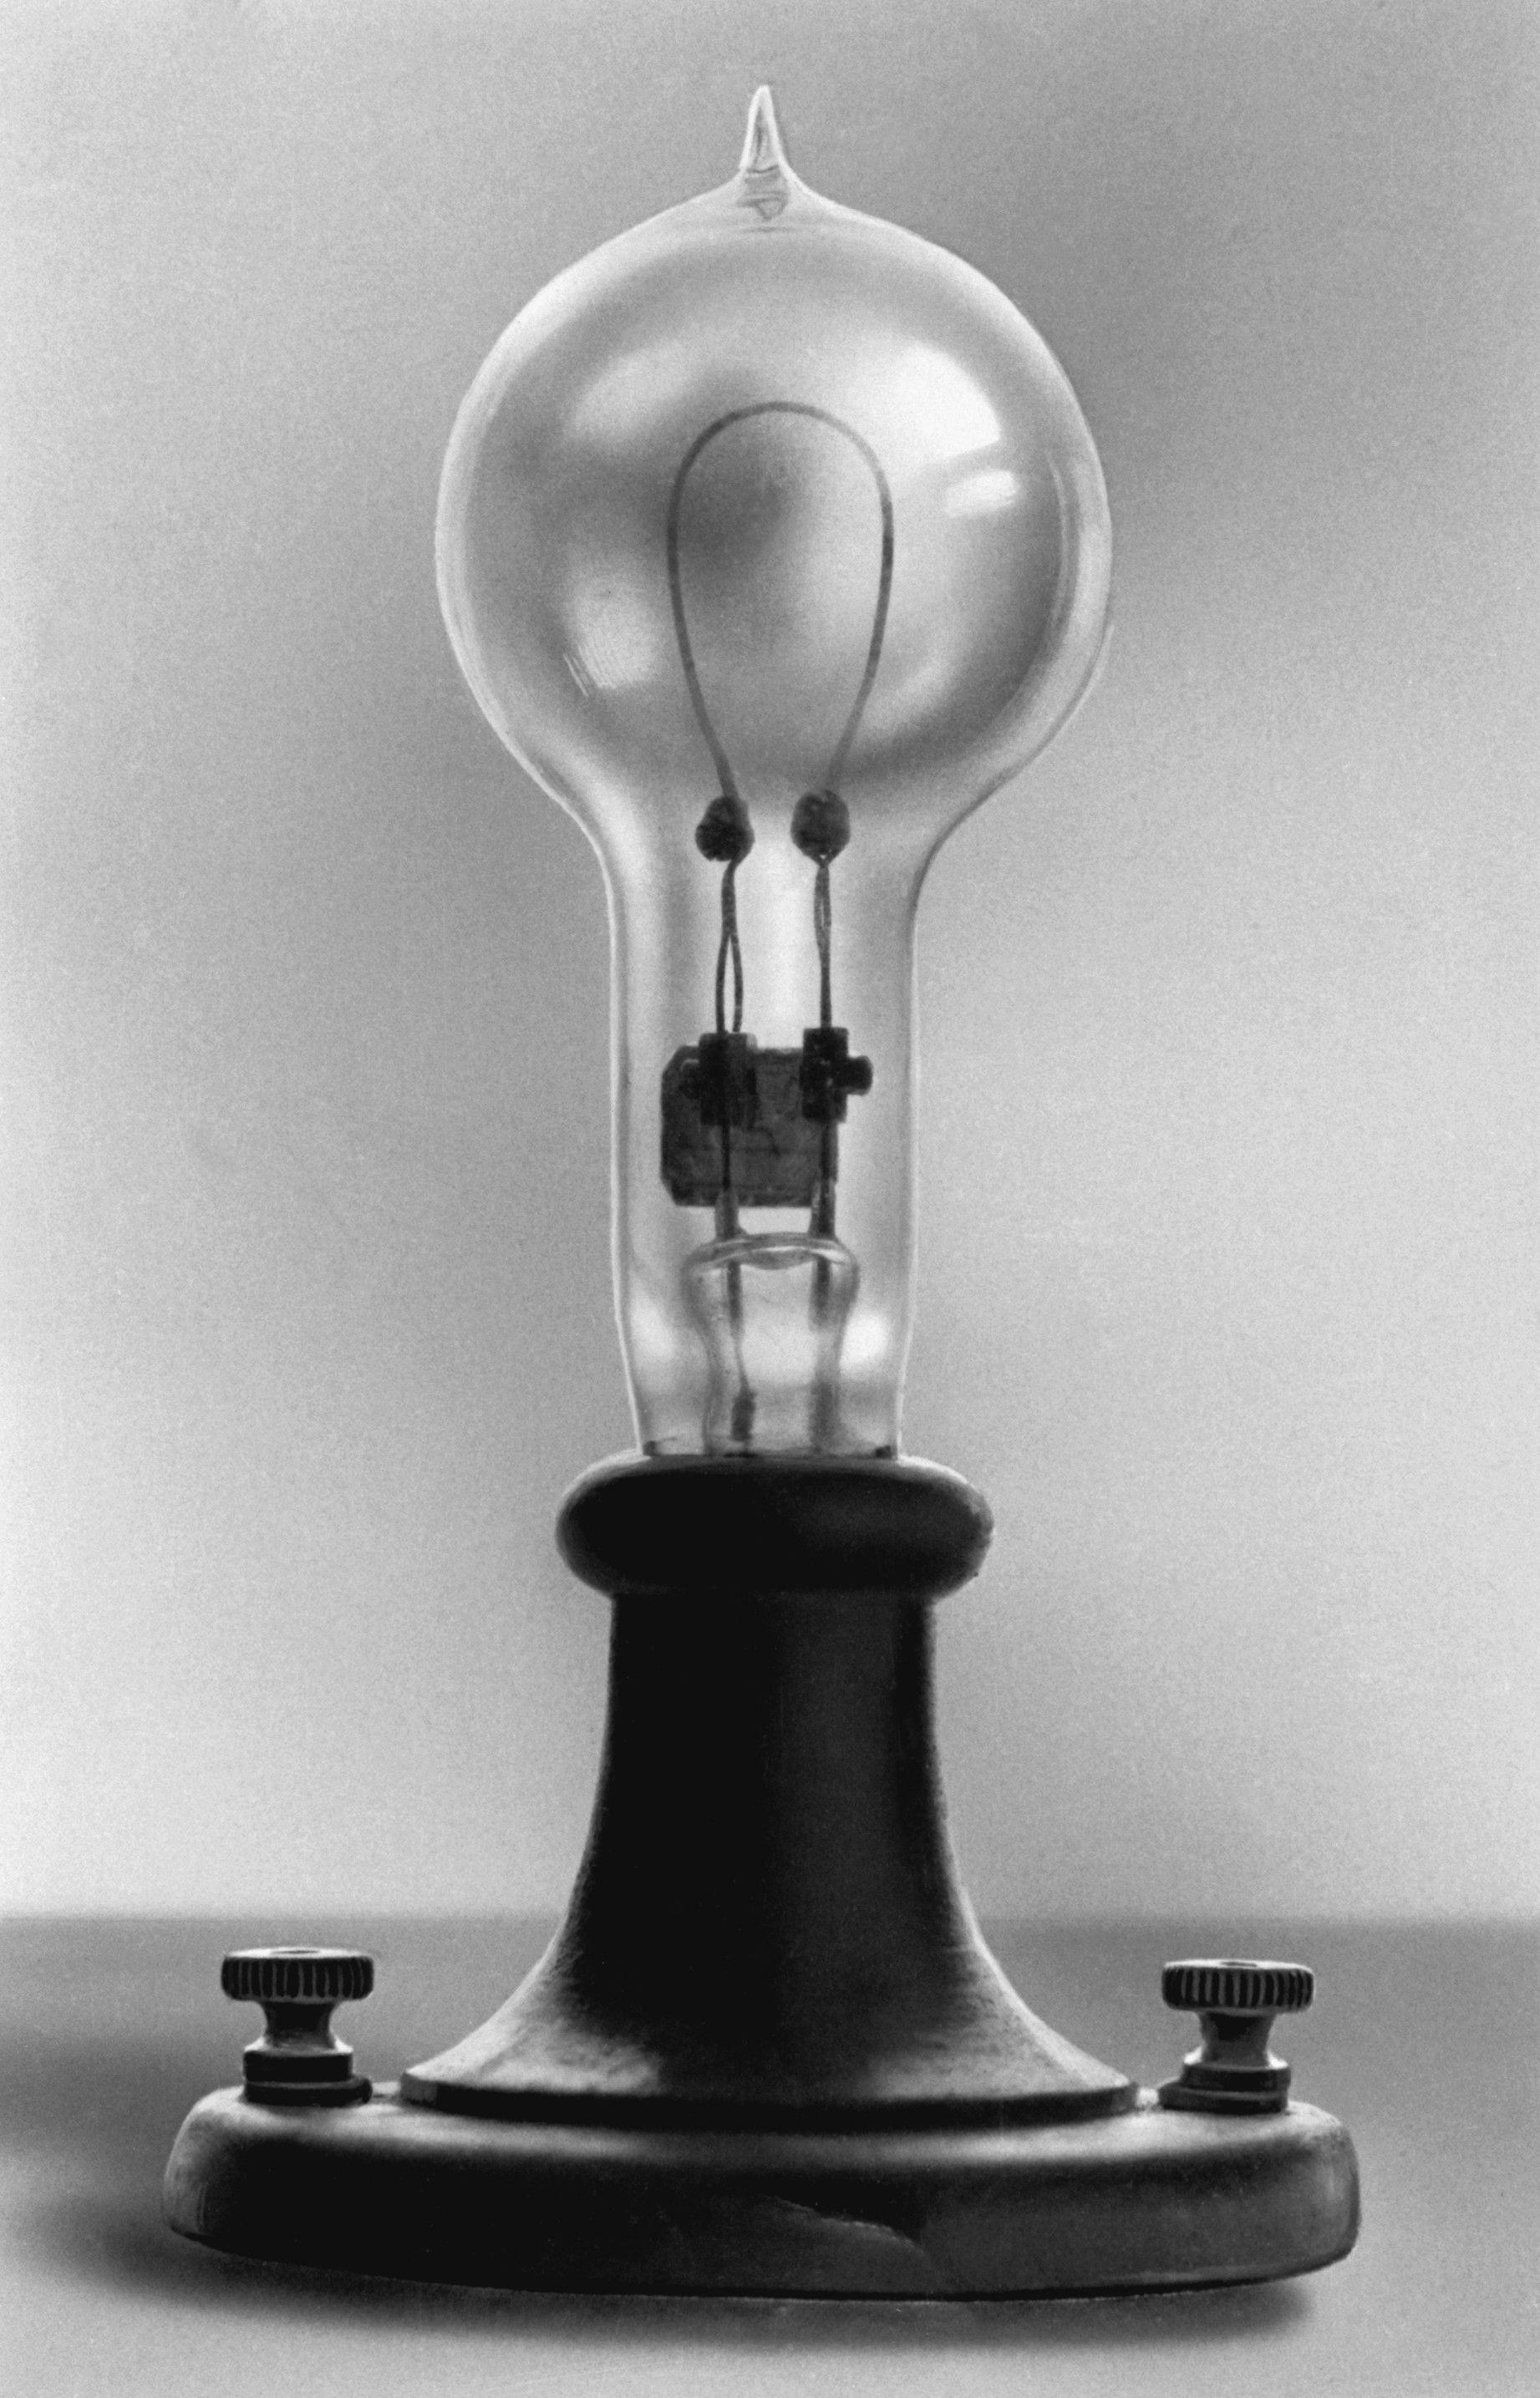 Thomas Edison Light Bulb Replica